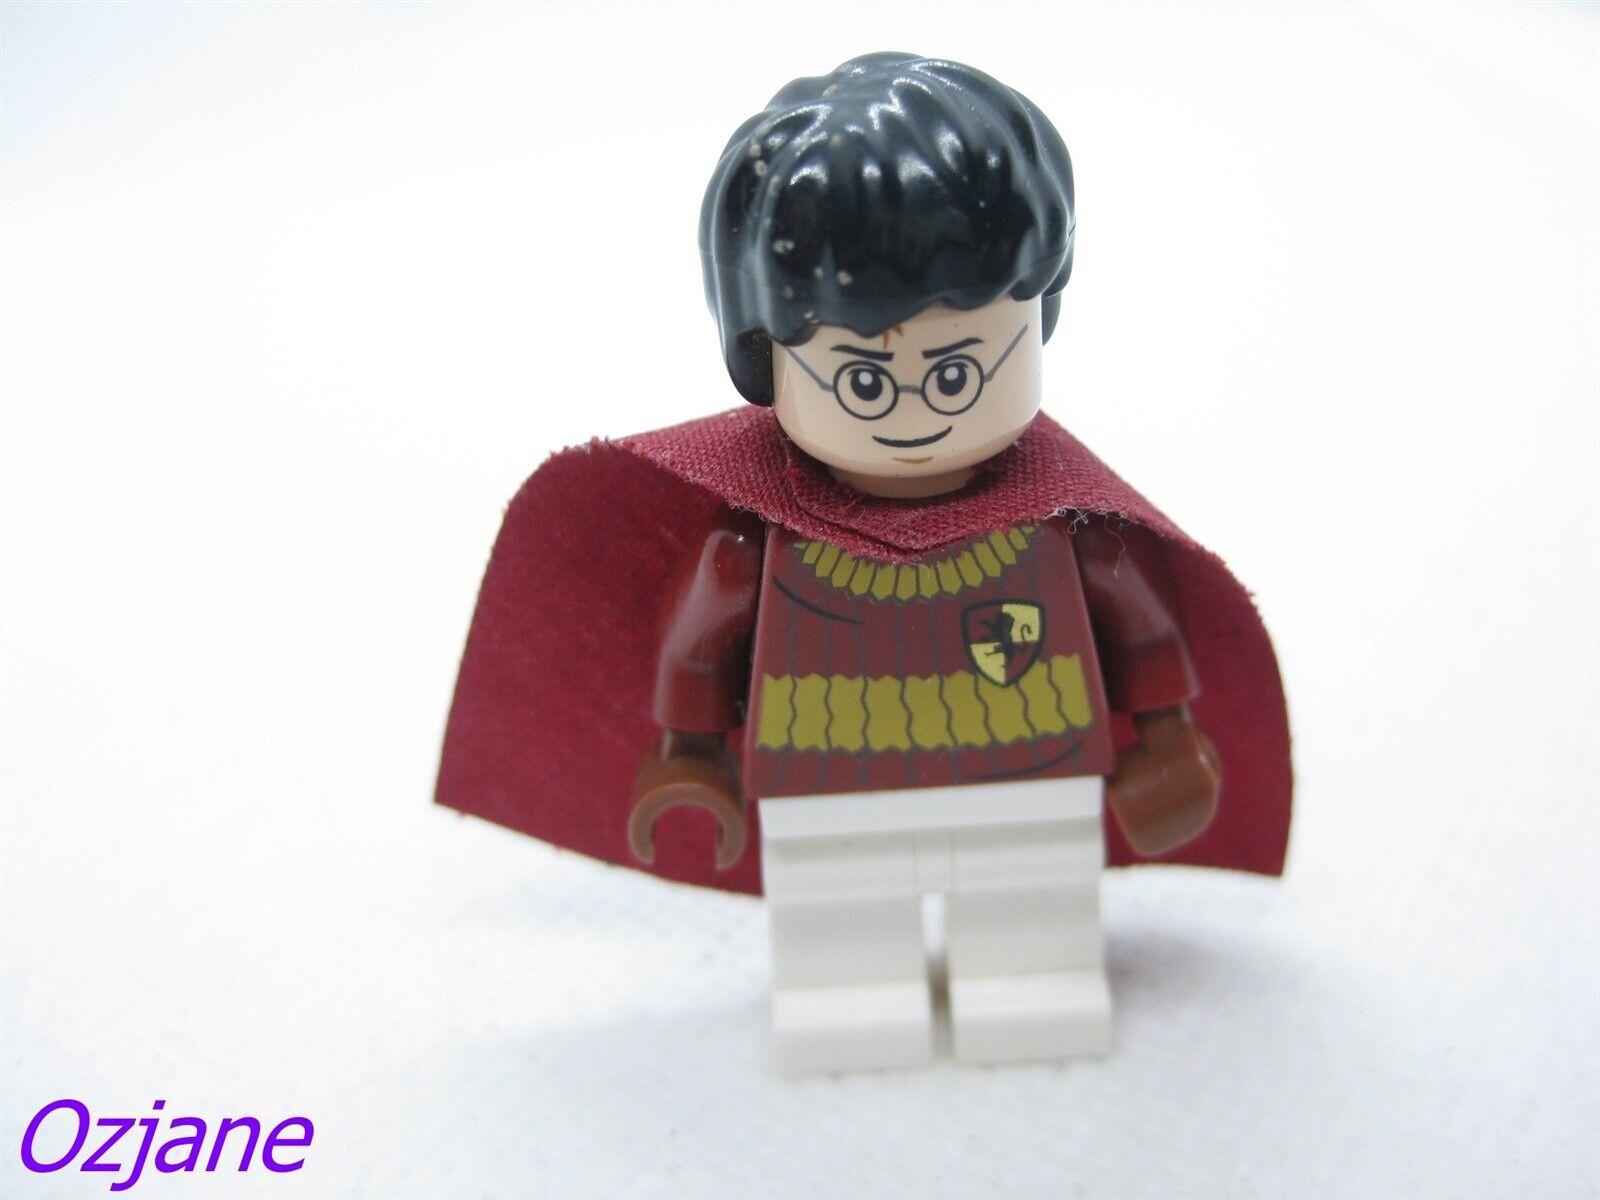 Lego Harry Potter Minifigure 4726 Quidditch Practice Figure Red Cape Original